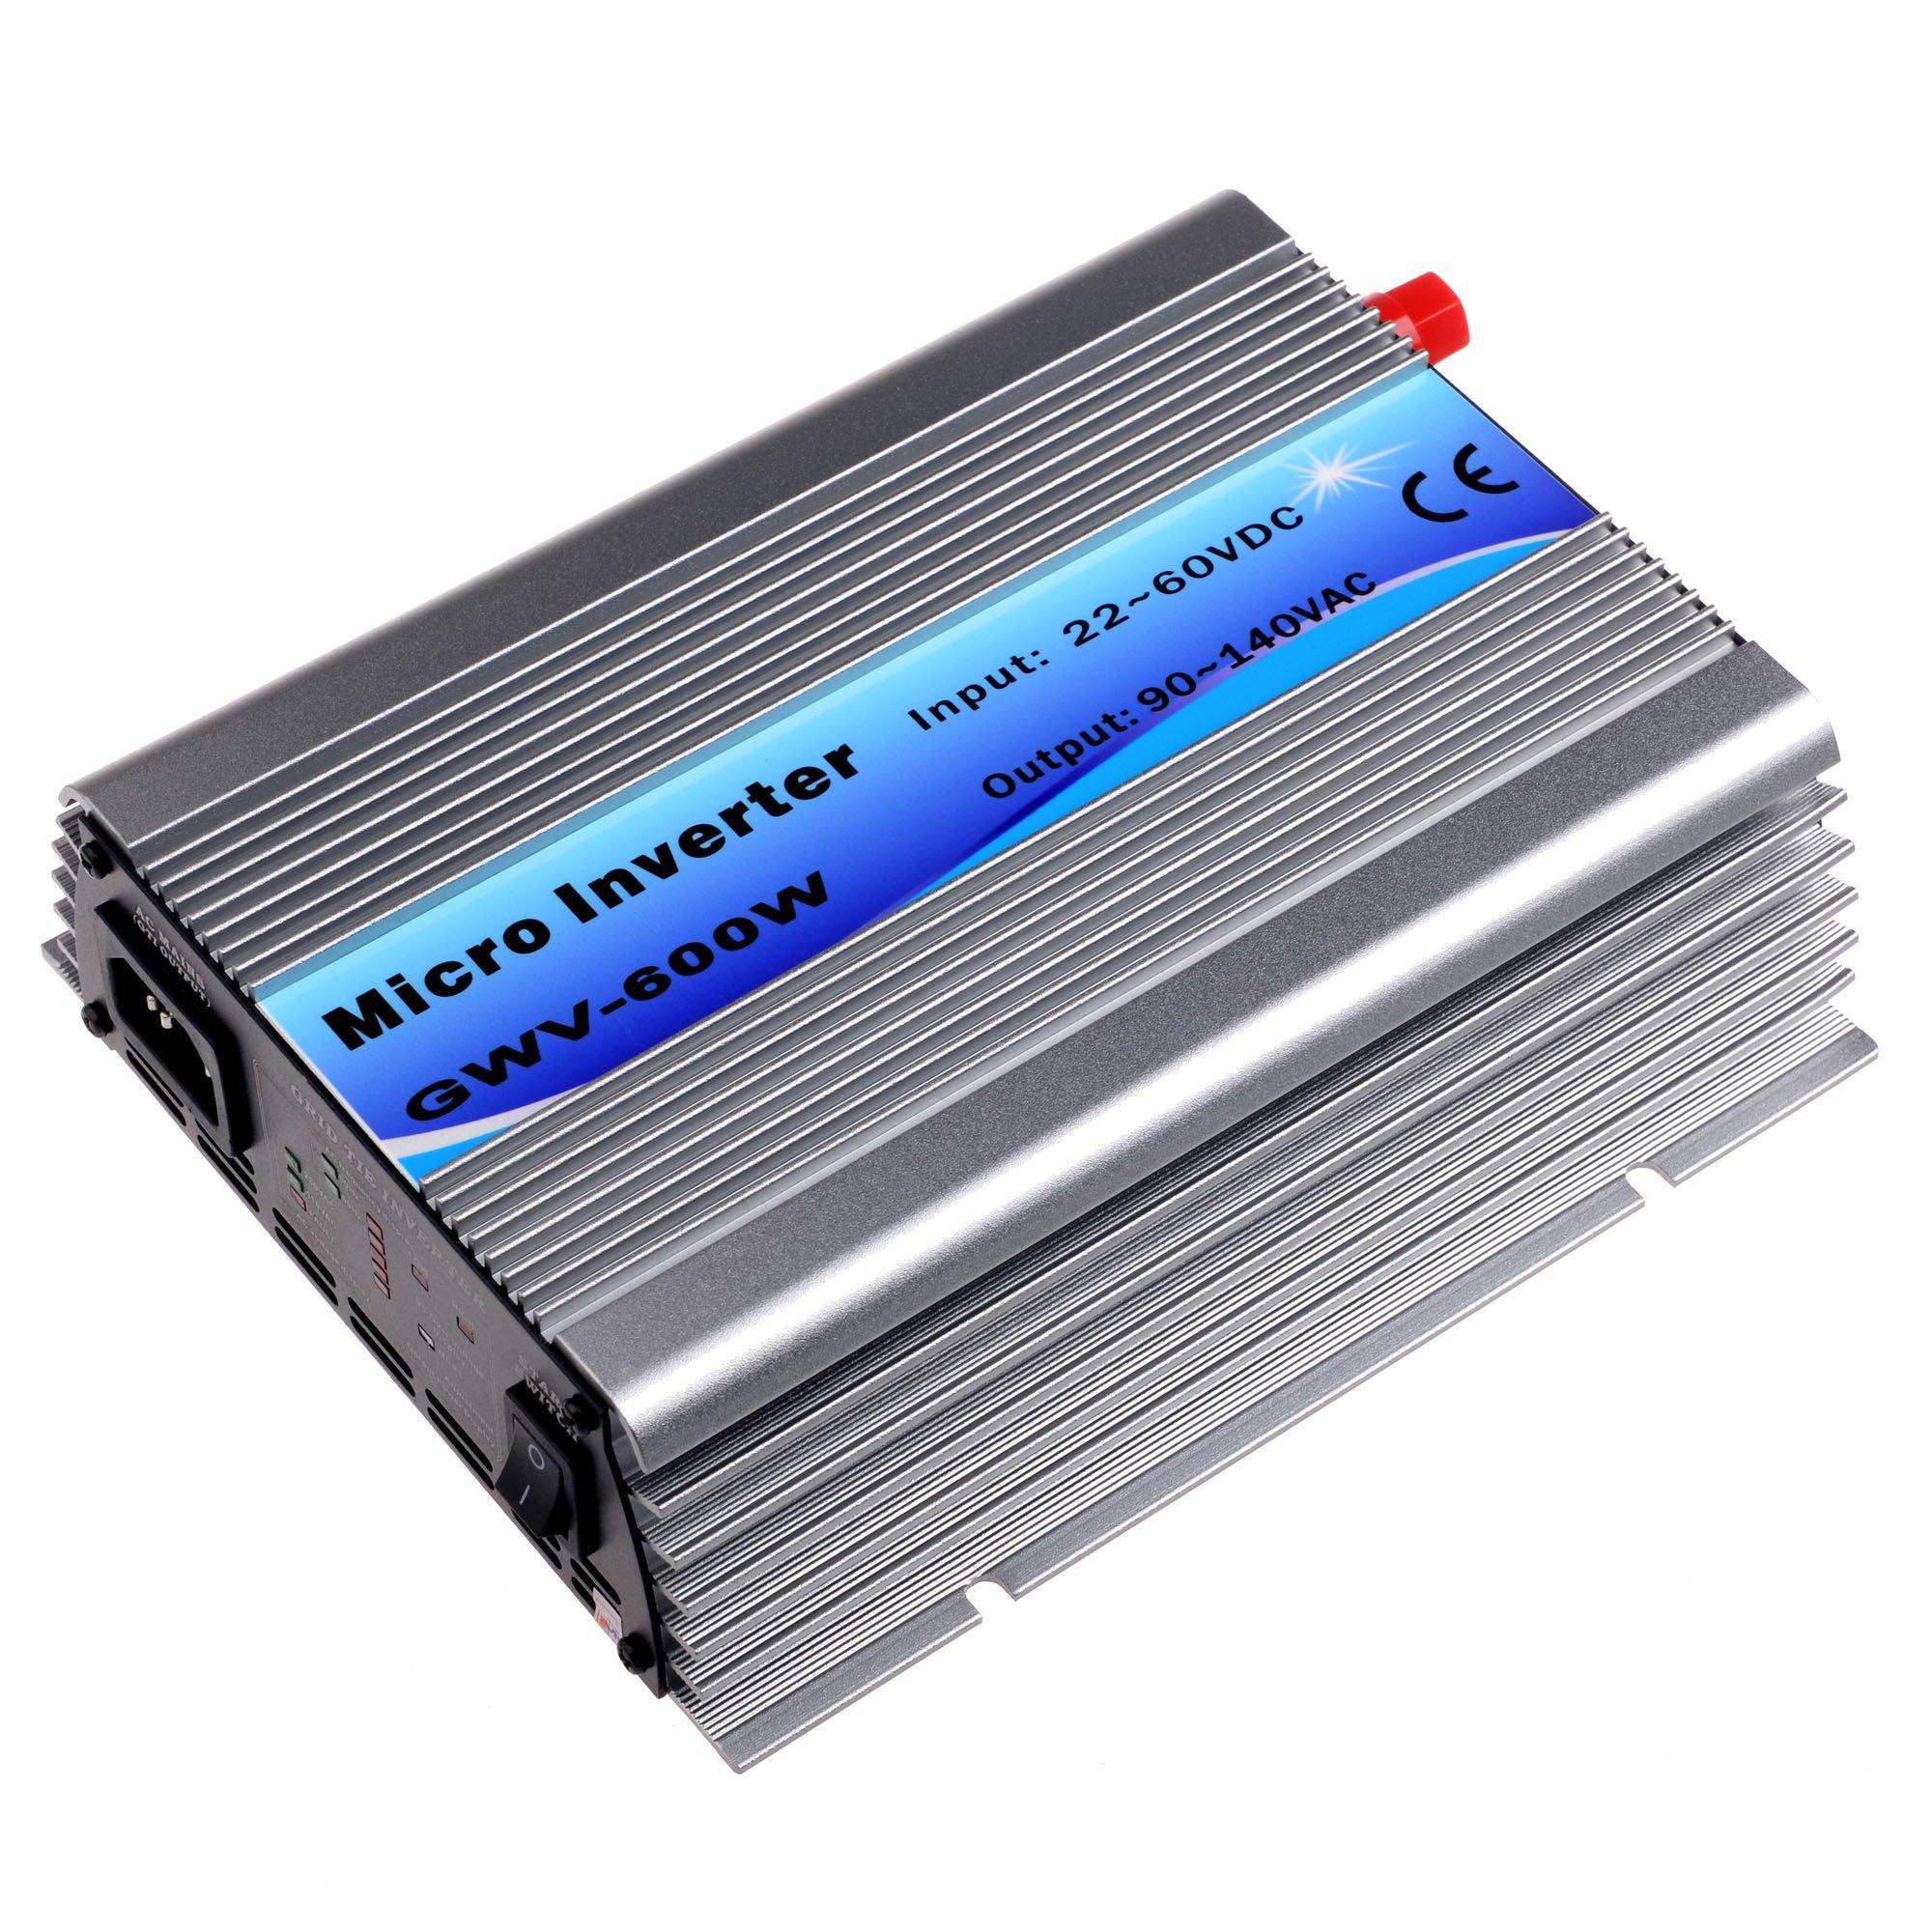 SolarEpic Micro Grid Tie Inverter 600W Stackable w/MPPT 22-60V DC Input 110V Output